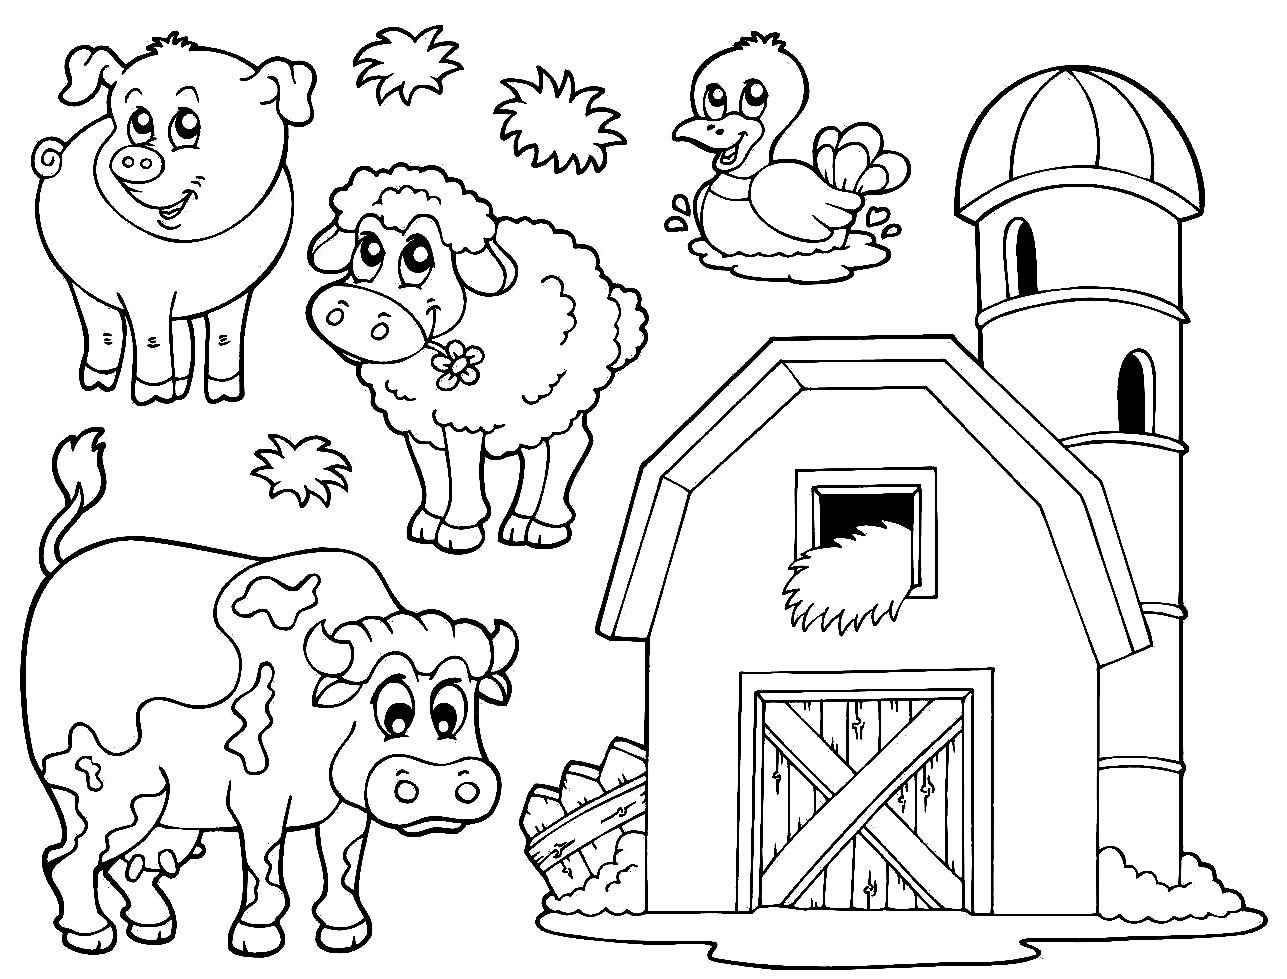 Desenho de fazenda para pintar e colorir